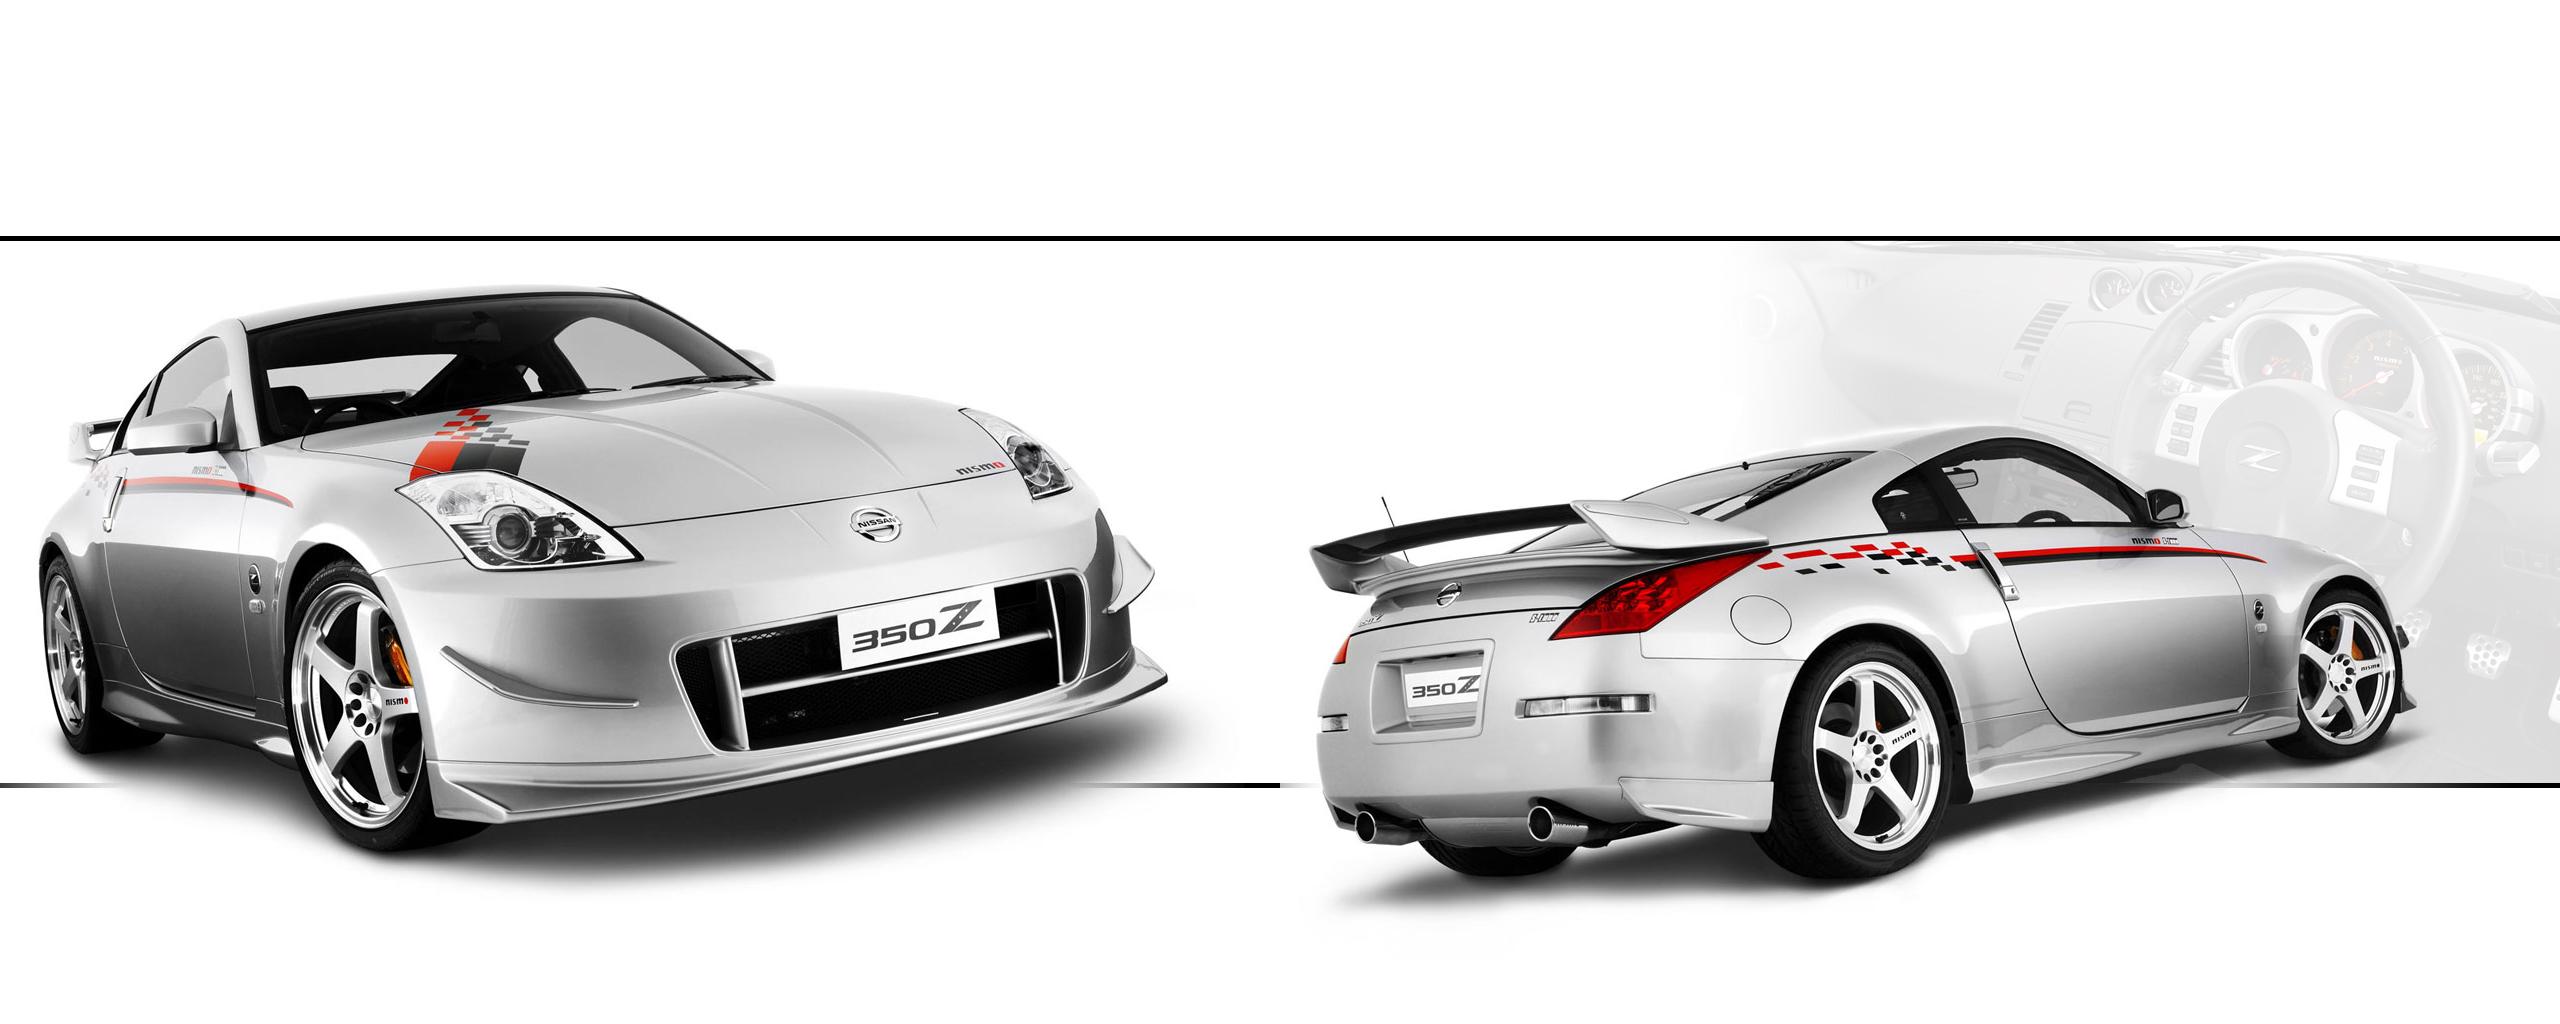 Dual Screen Desktop Wallpaper Cars 2560x1024